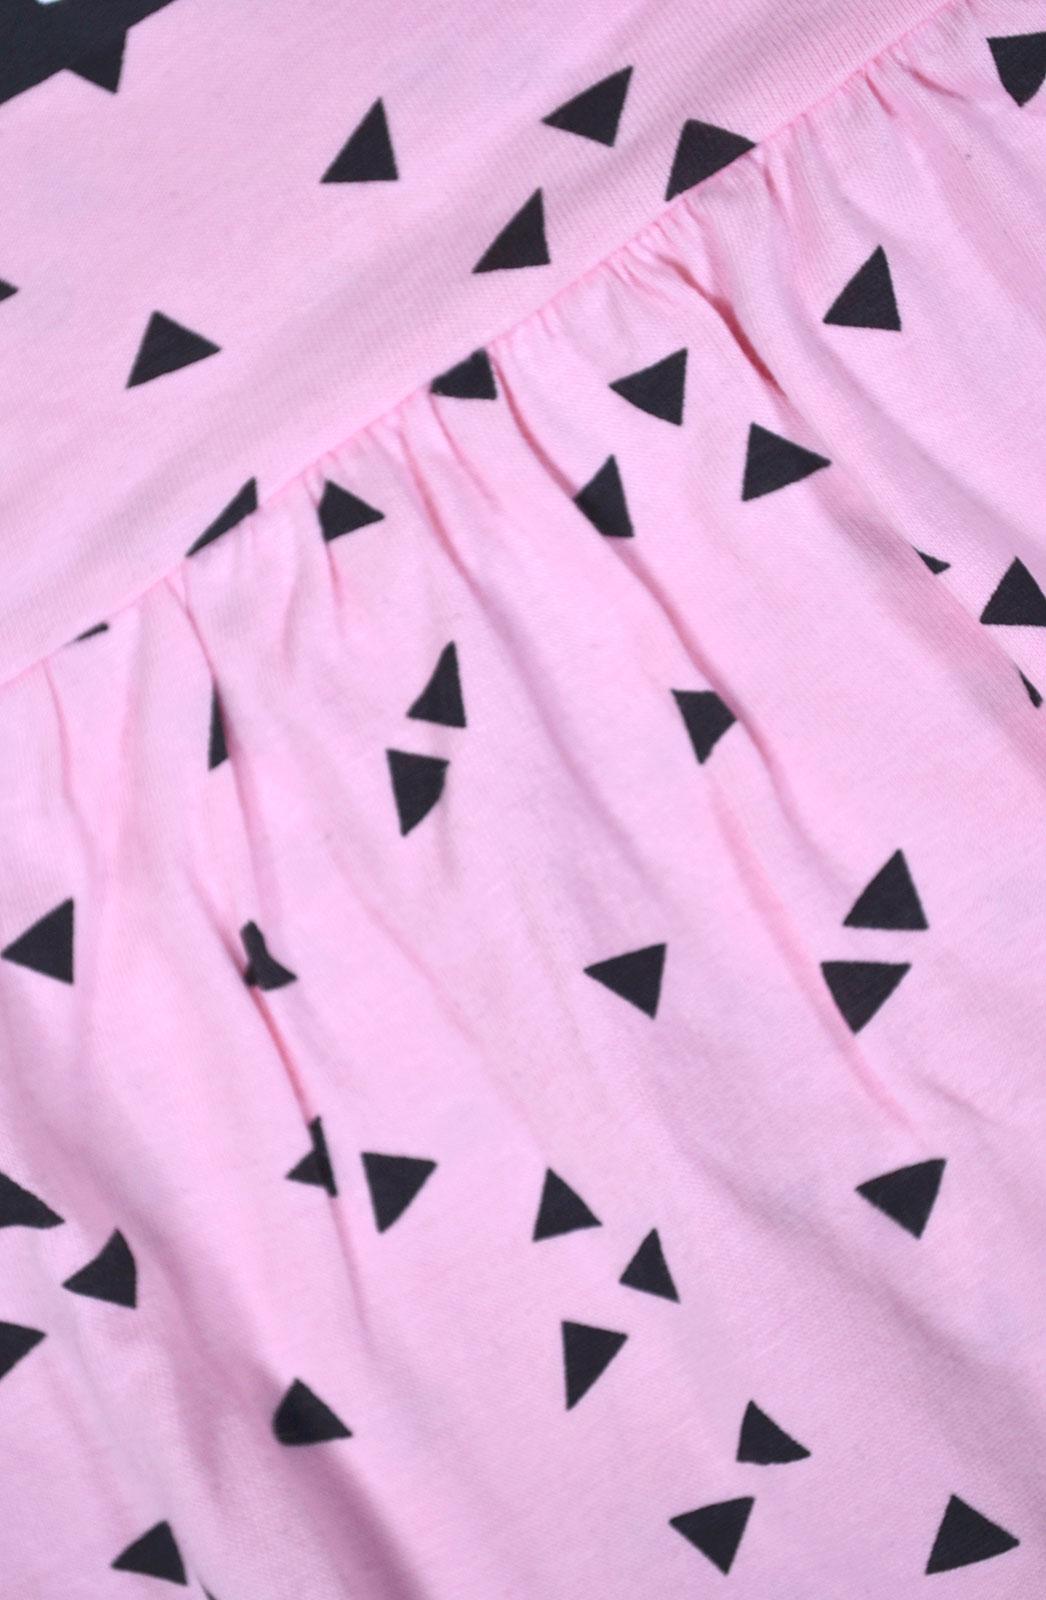 Girls-Summer-Dress-Kids-New-Skater-Dress-Cotton-Pink-Black-Age-2-3-4-5-6-7-8-Yrs thumbnail 5